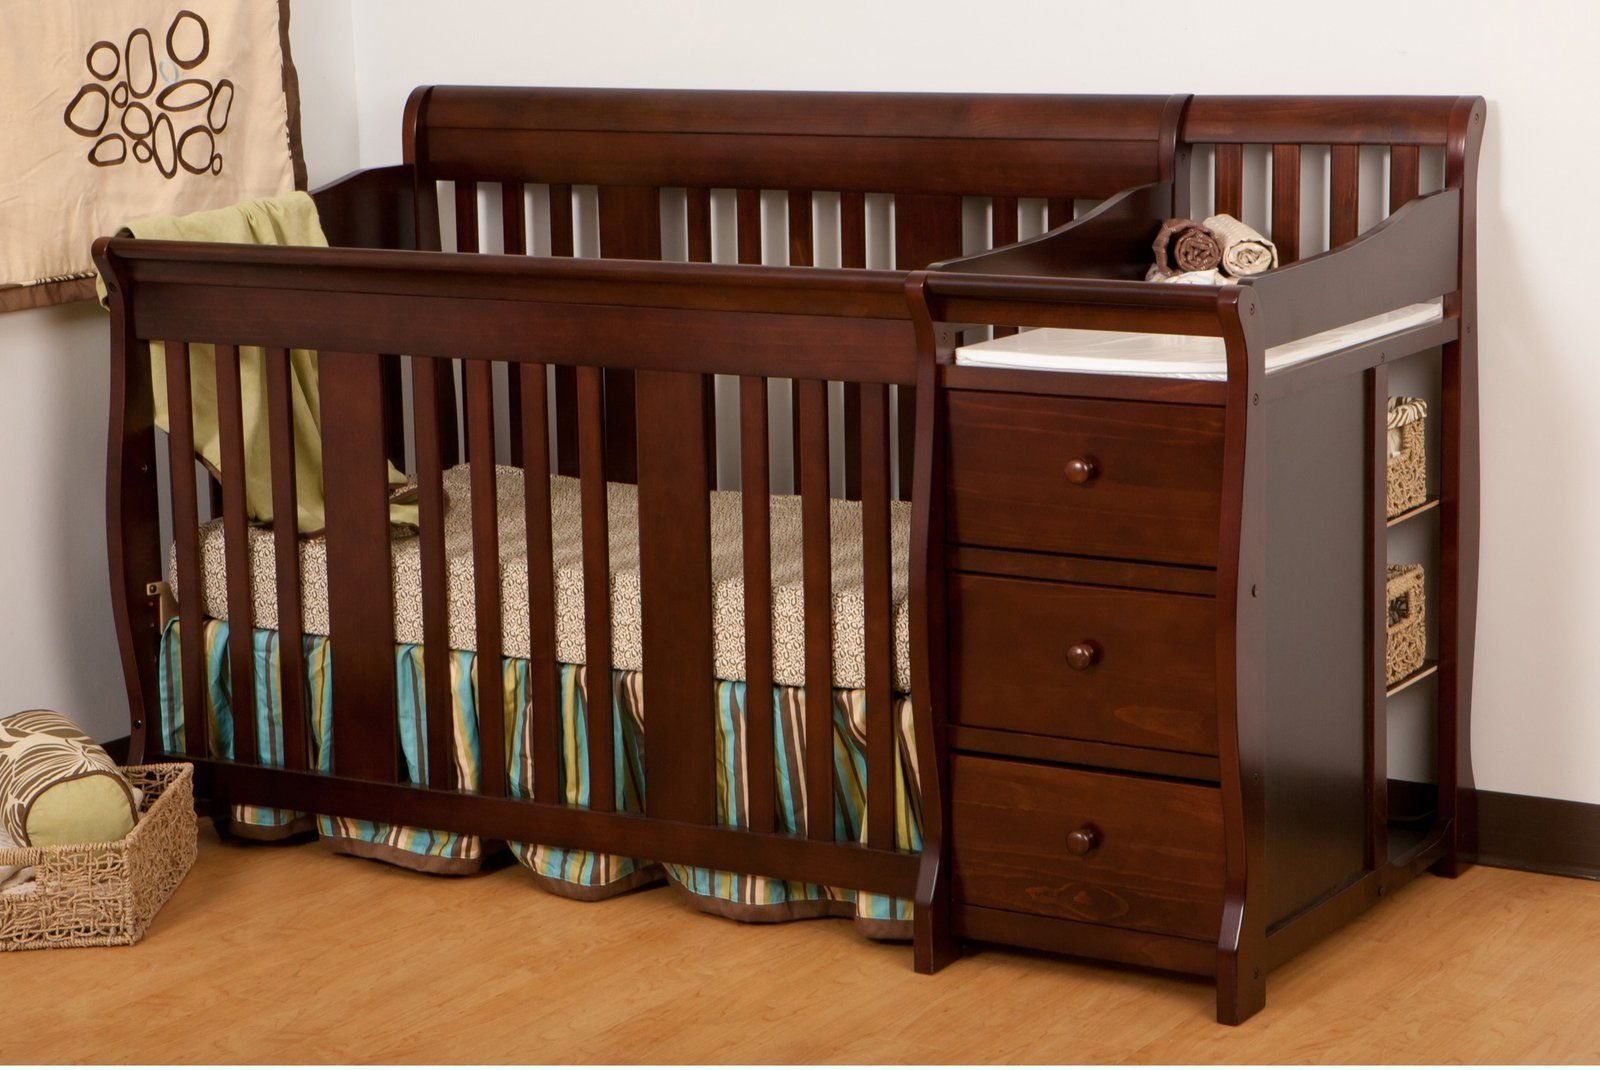 Storkcraft Portofino 4 In 1 Fixed Side Convertible Crib Changer Espresso Diaperscomnursery Disney Crib Bedding Crib With Changing Table Cribs